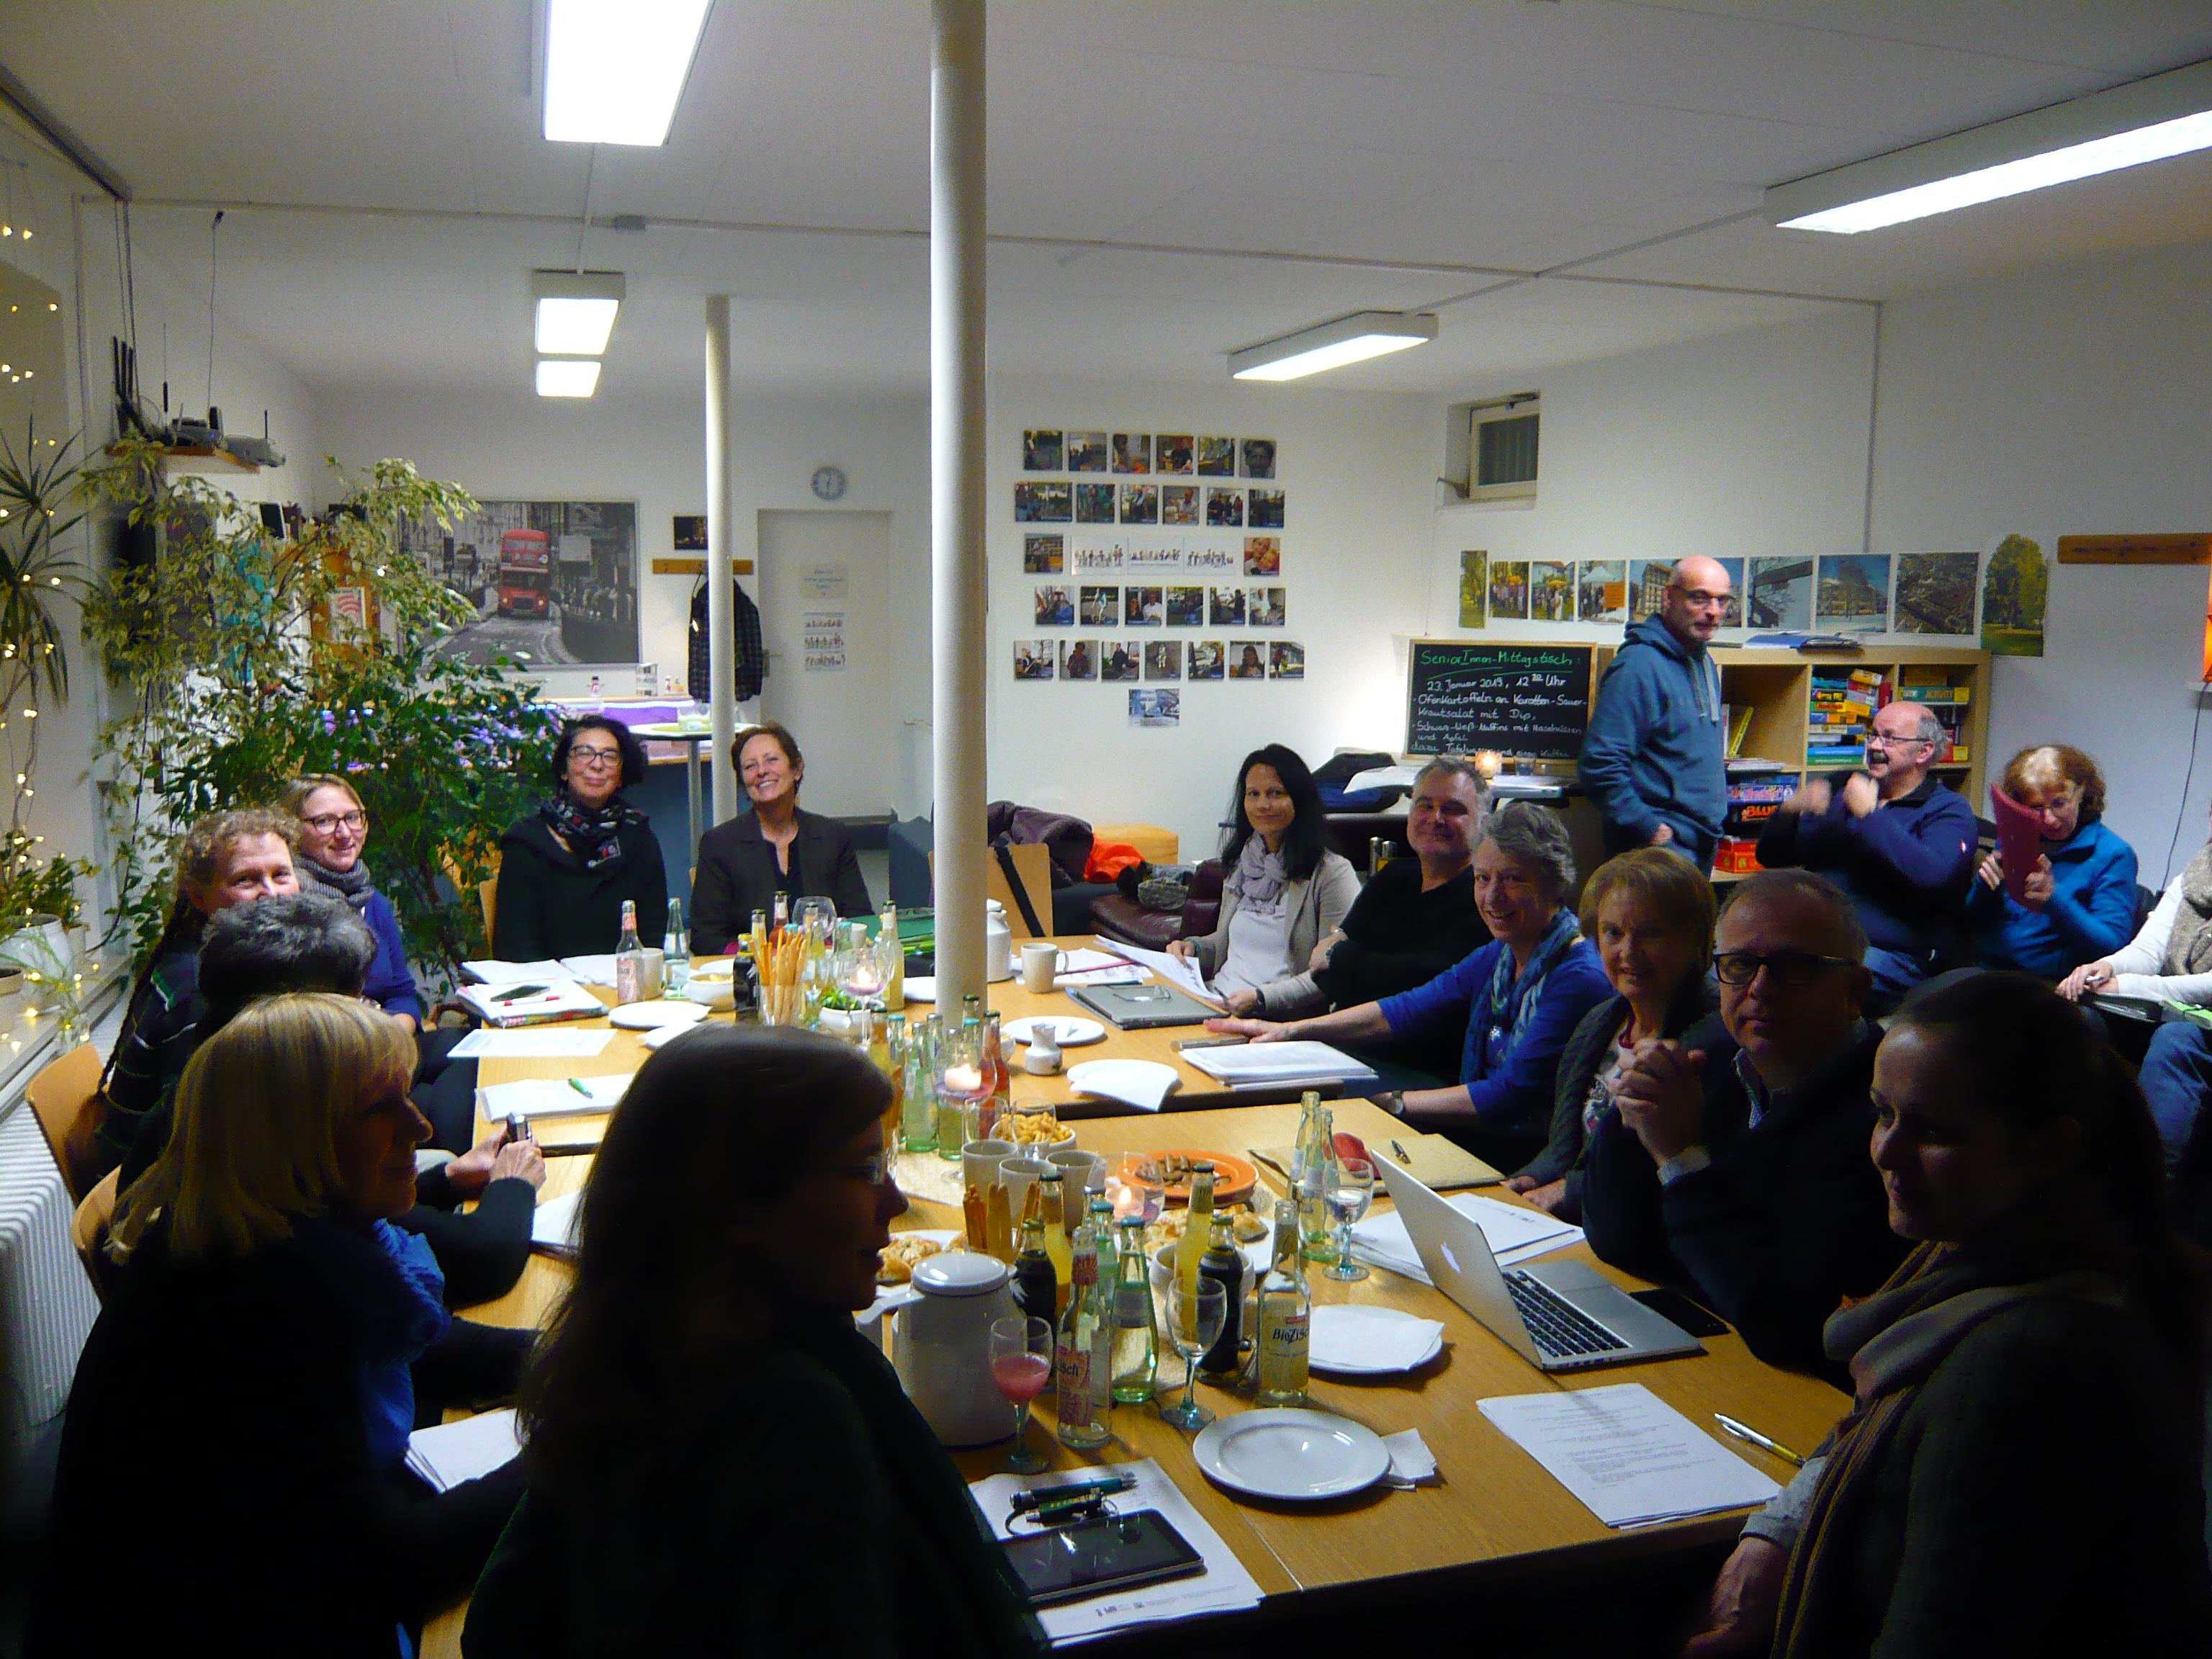 Sozialausschuss der Stadtverordnetenversammlung tagt im Quartierladen